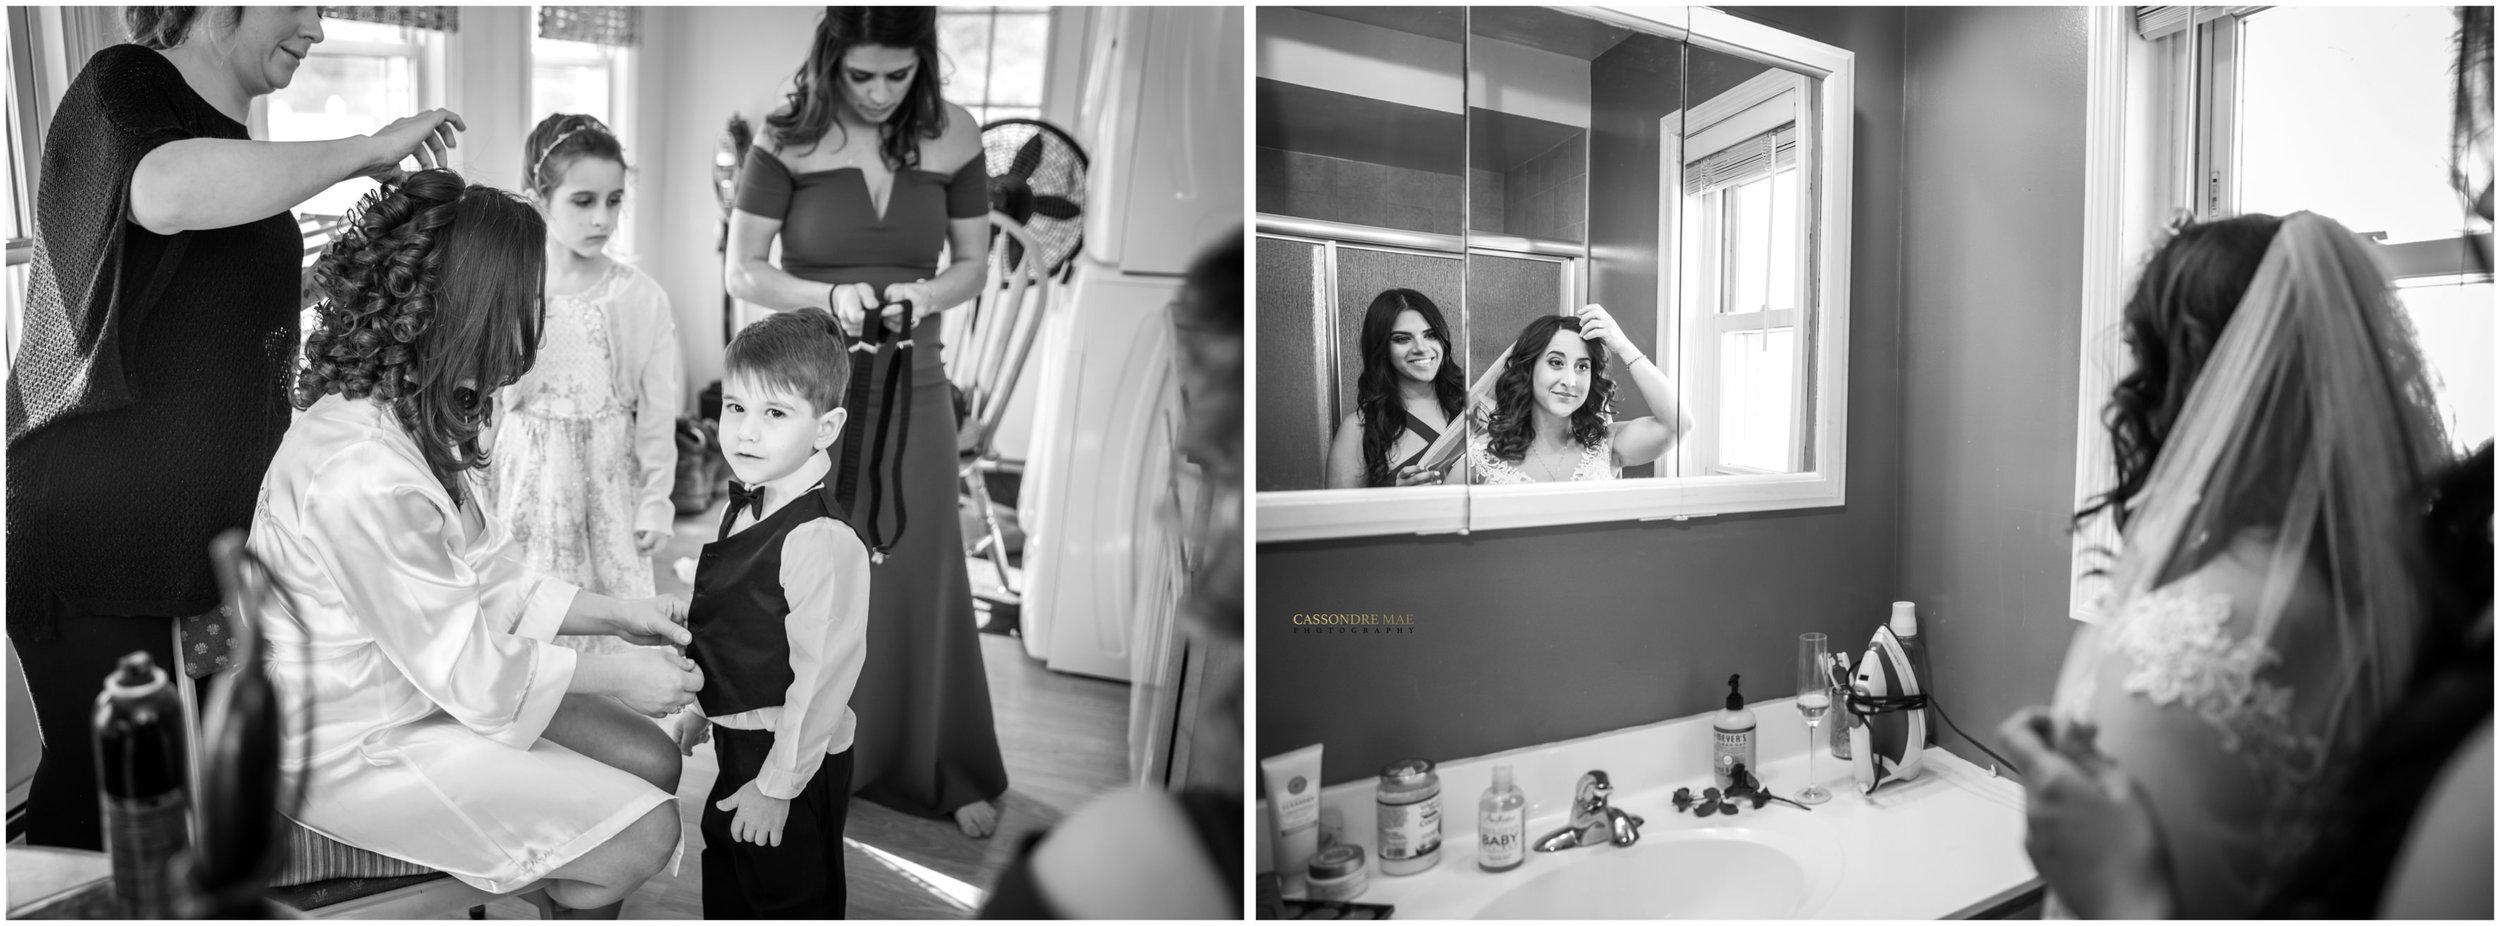 Cassondre Mae Photography The Grandview Weddings 23.jpg